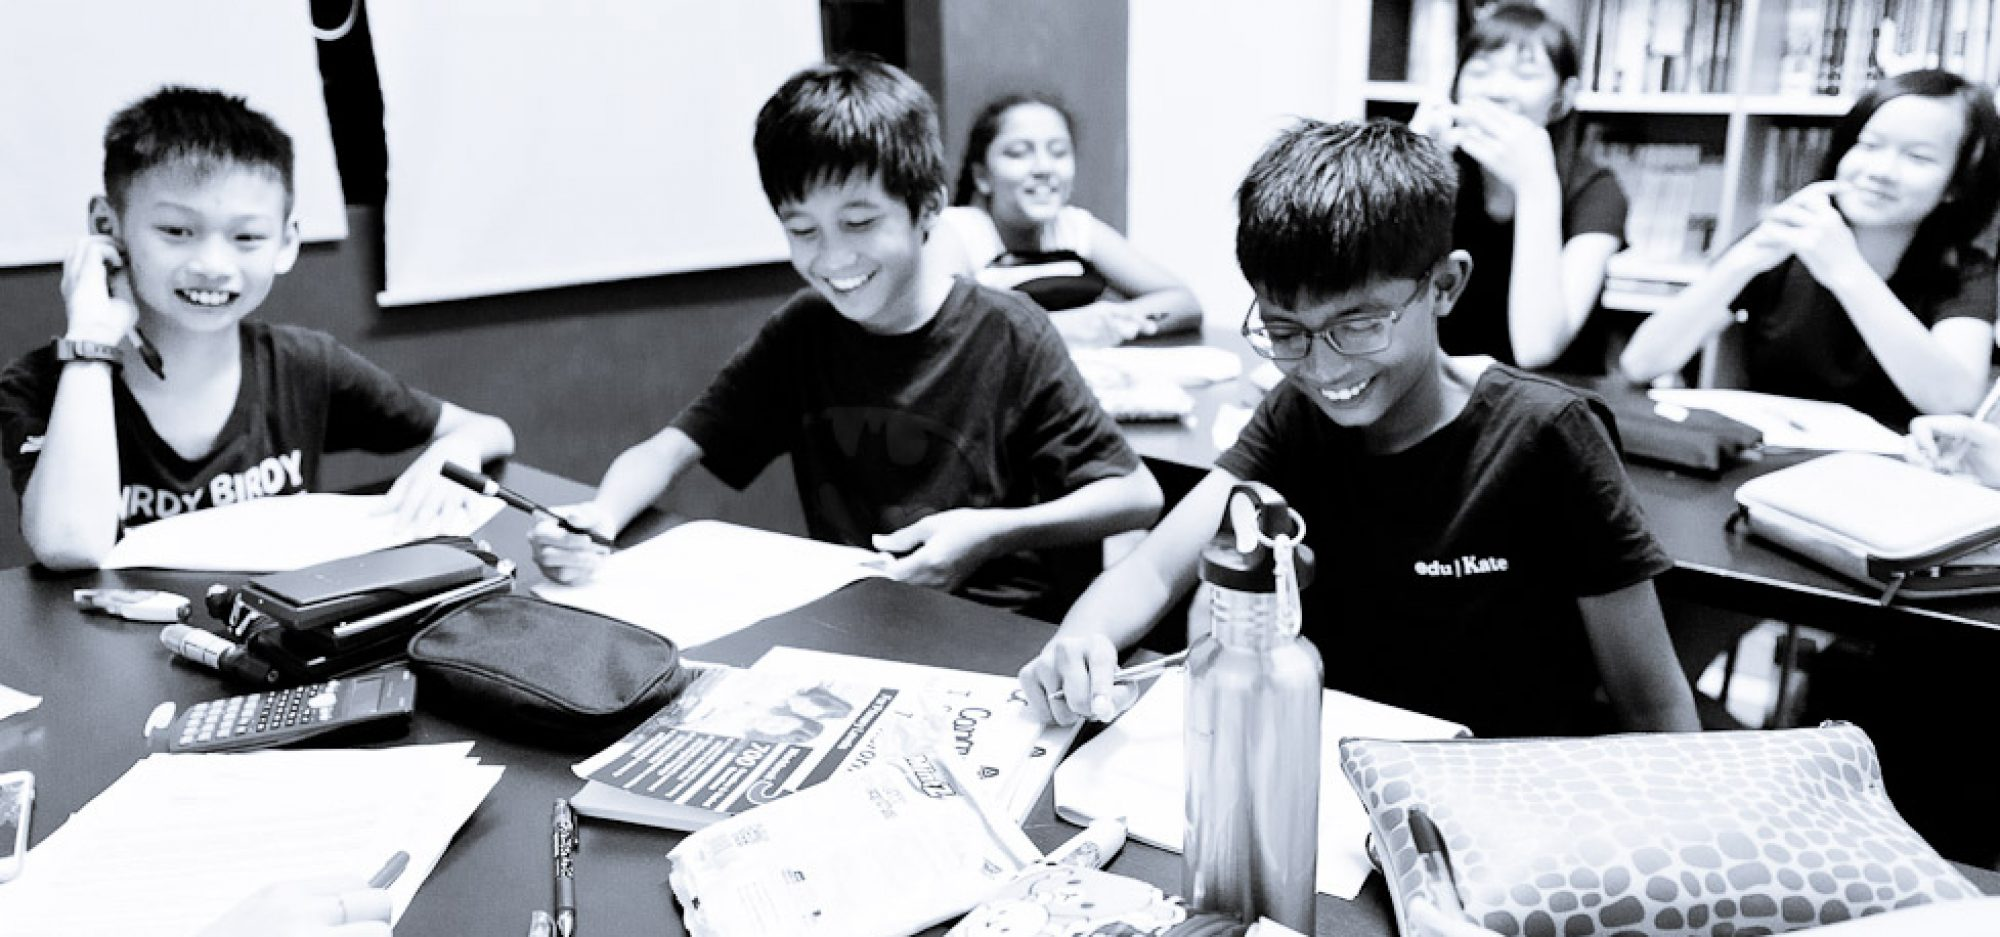 Yishun English and Mathematics Tuition  English Math Tuition Small Group Tuition Centre tutor english math science primary secondary small group tuition